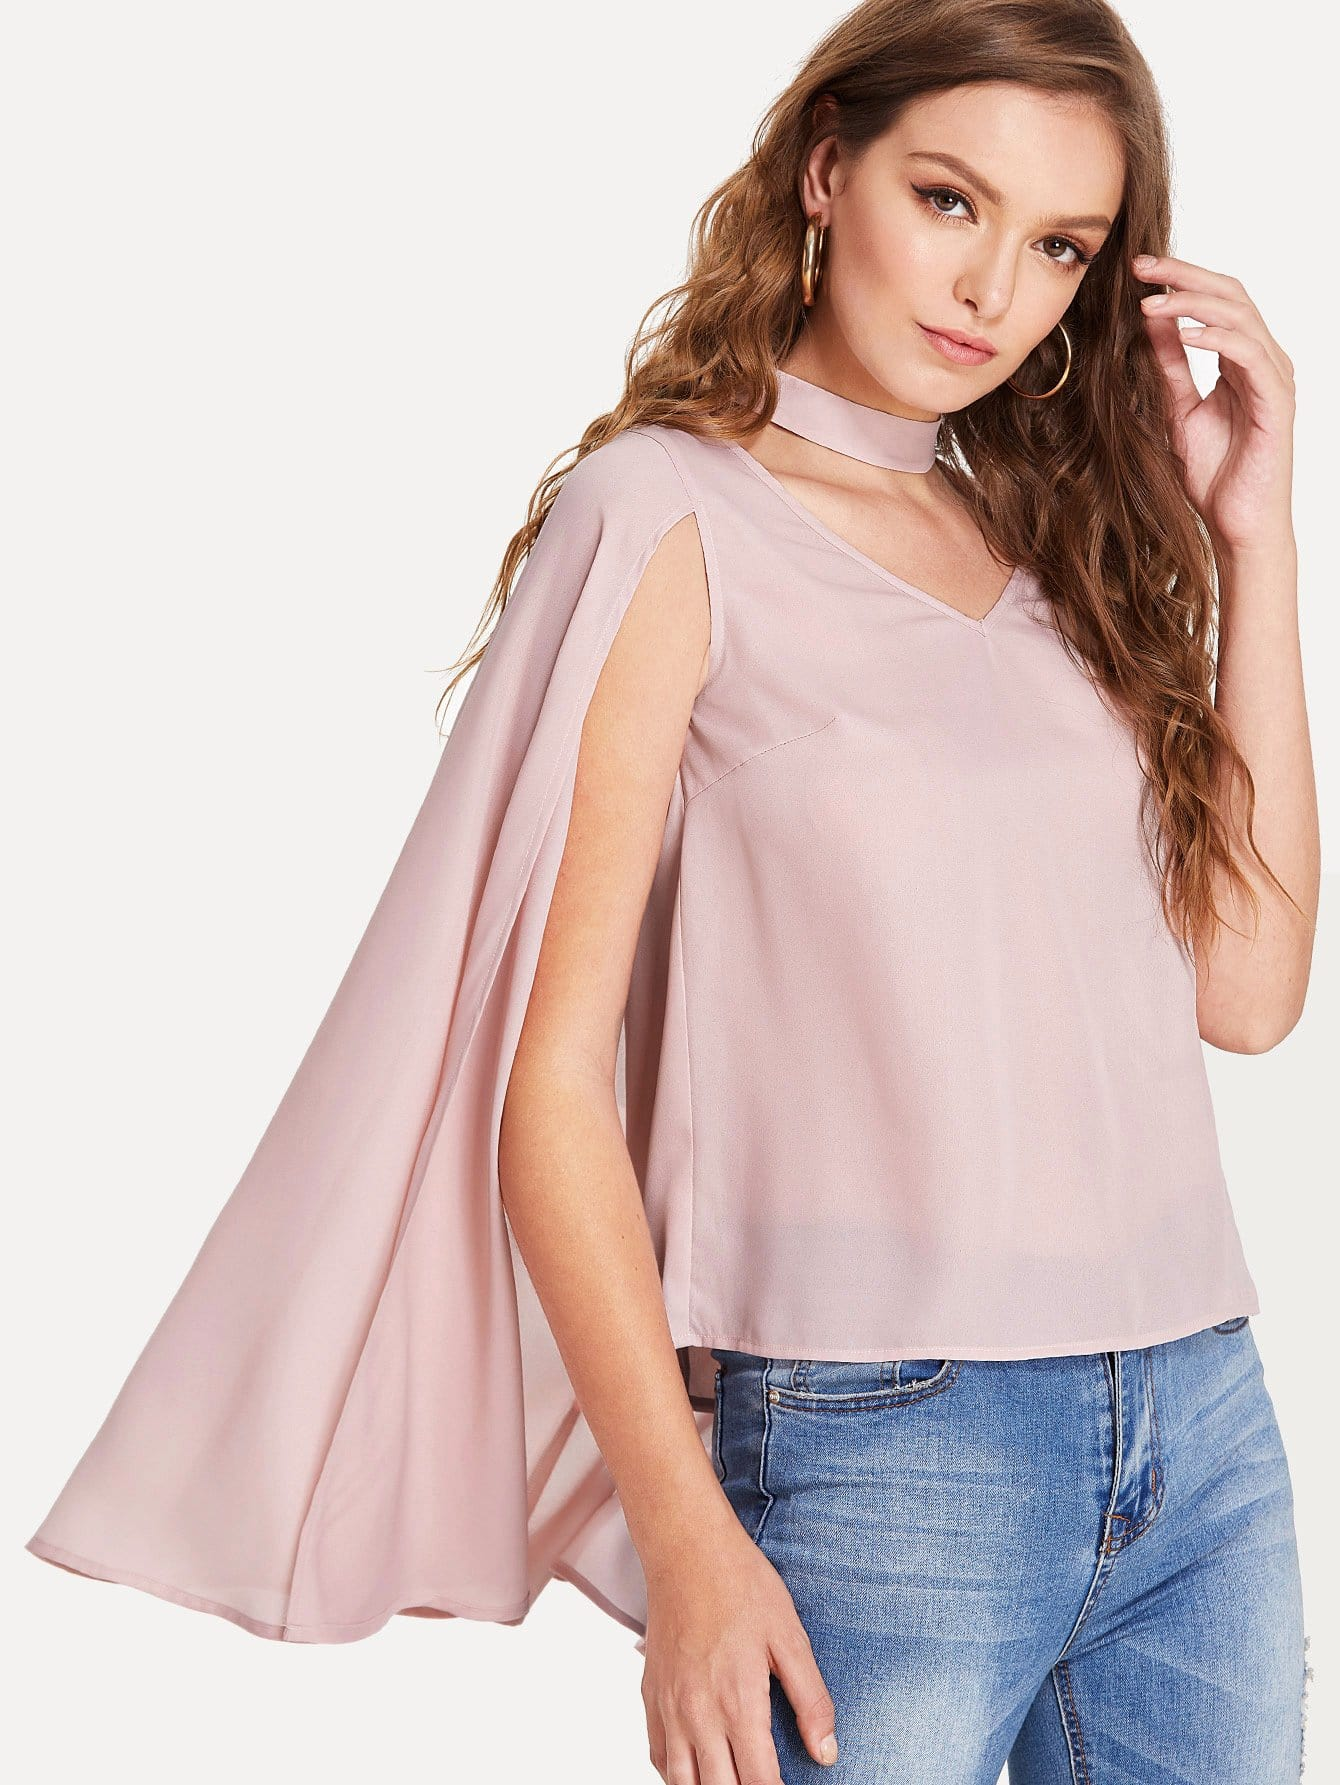 Choker Neck Cloak Sleeve Top choker neck bishop sleeve floral top